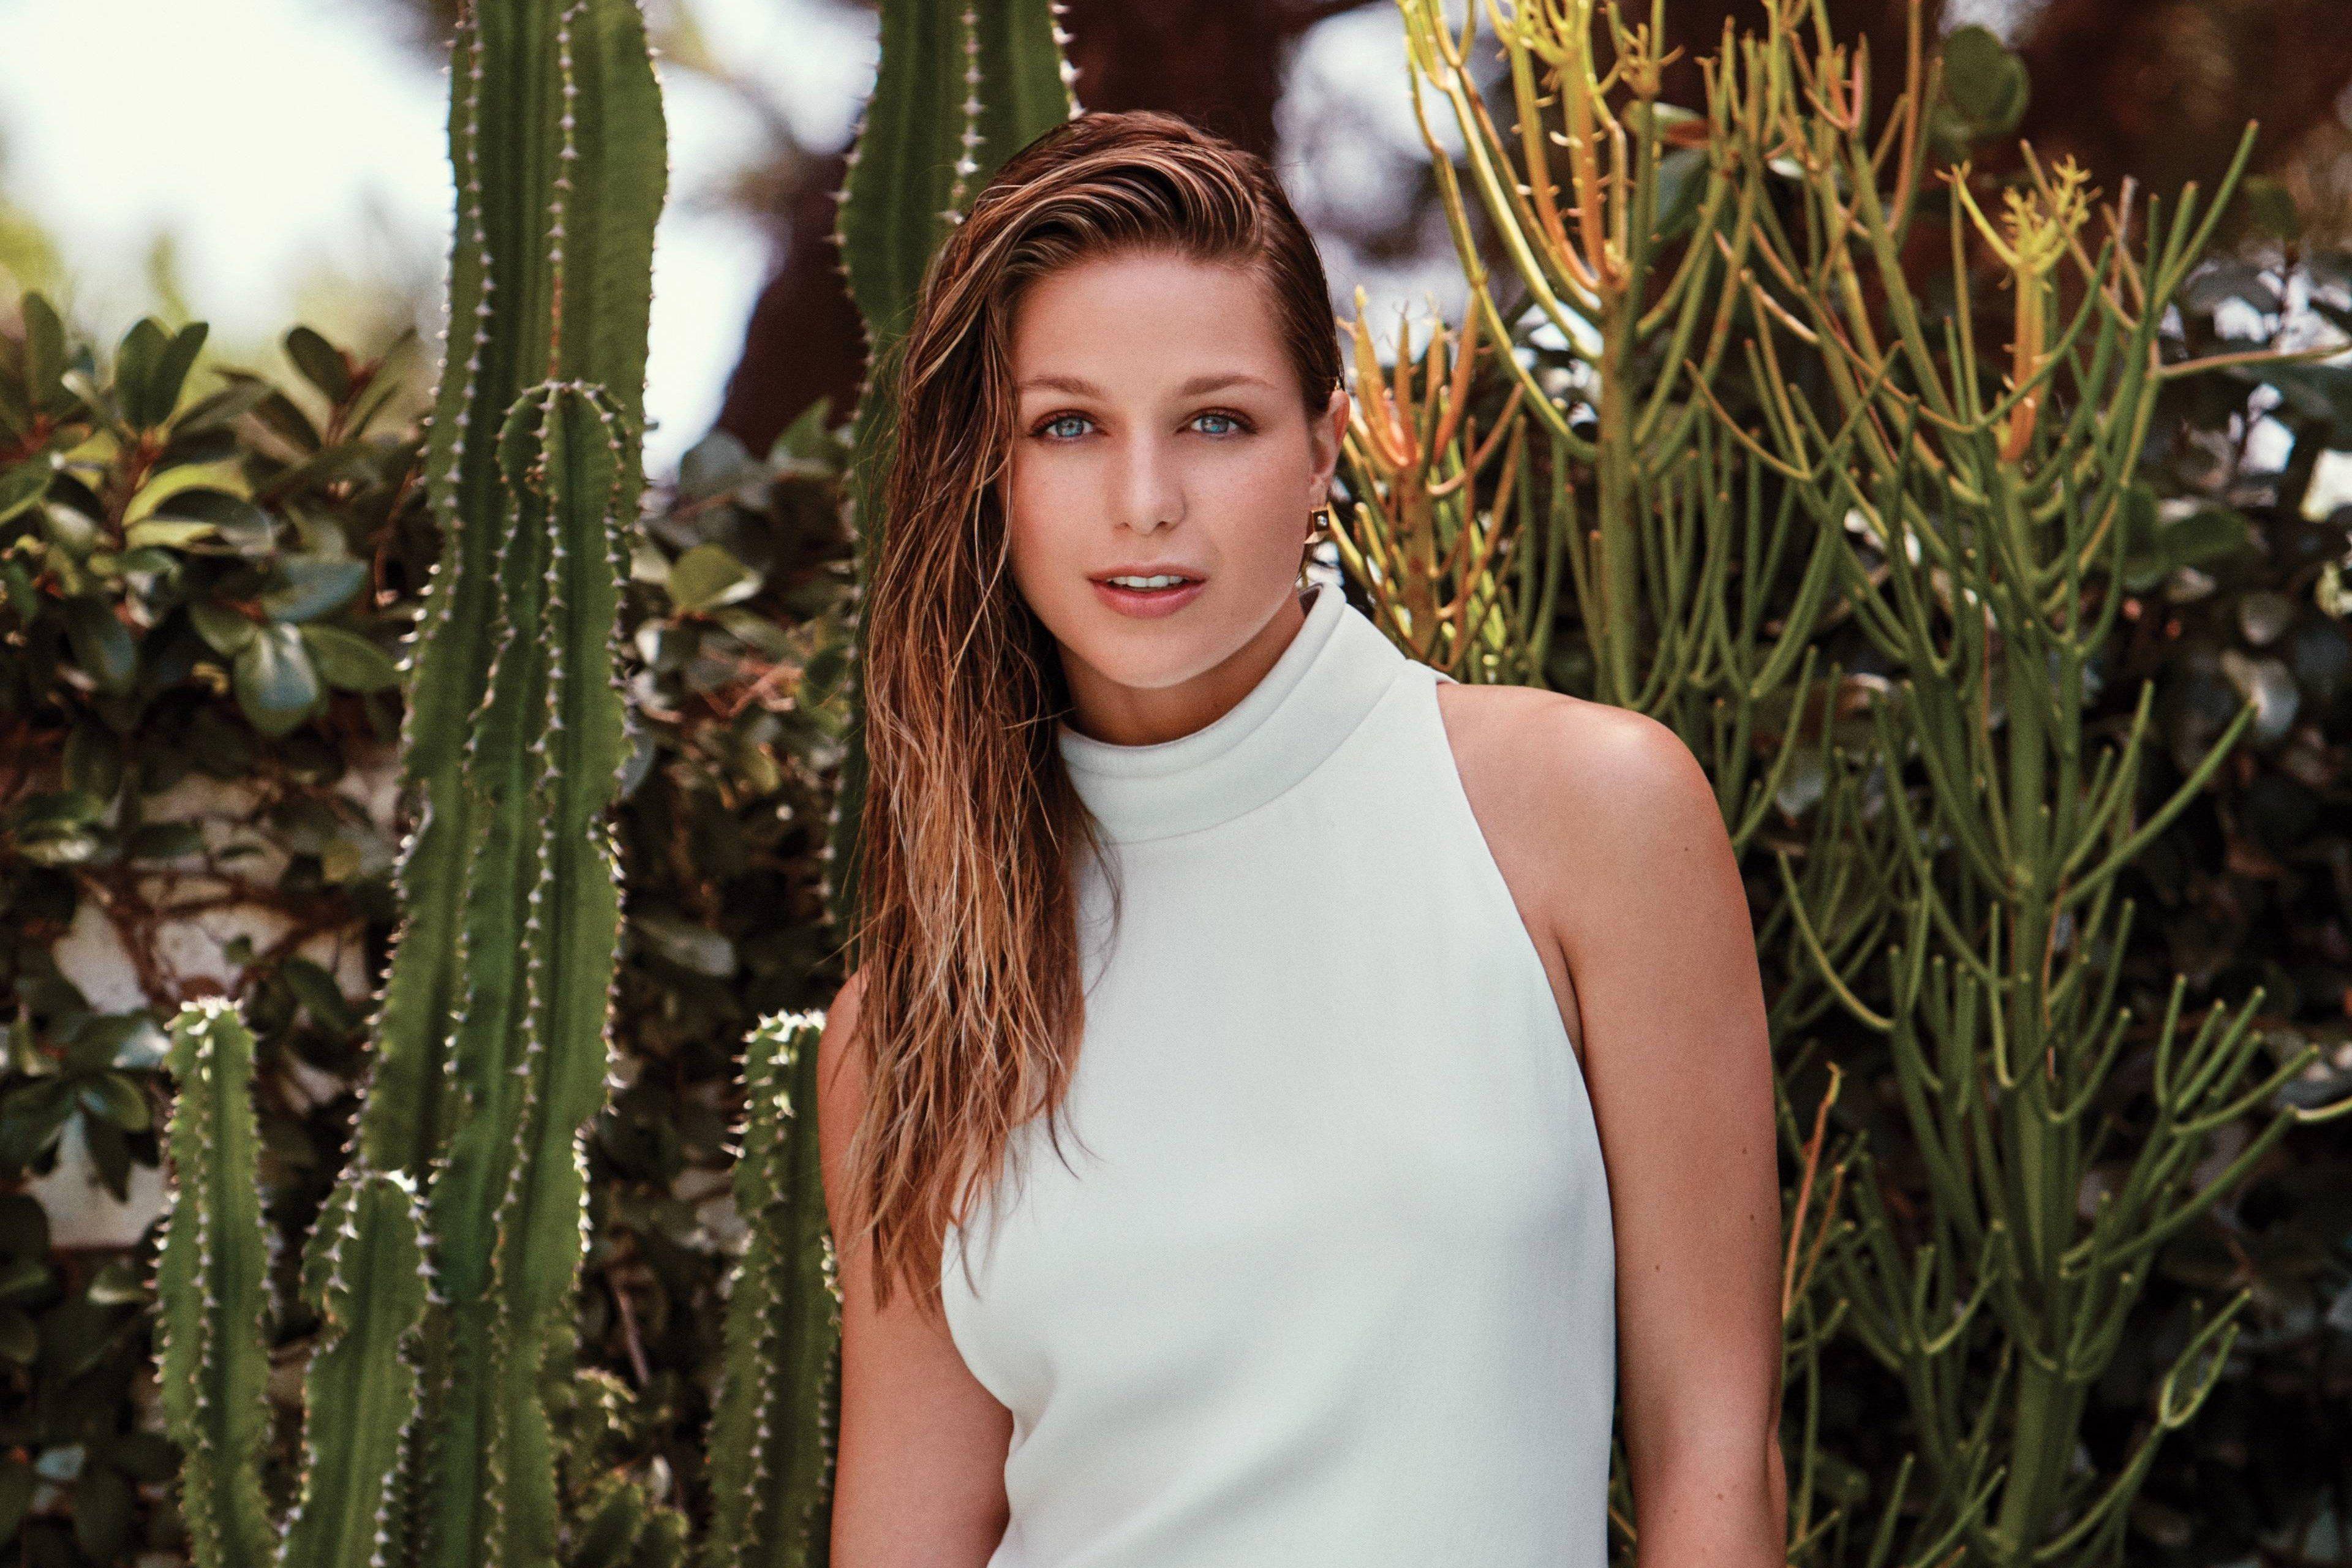 3840x2560 Melissa Benoist 4k Free Download Hd Wallpaper For Desktop Melissa Benoist Amerikanische Schauspieler Frauen Stars